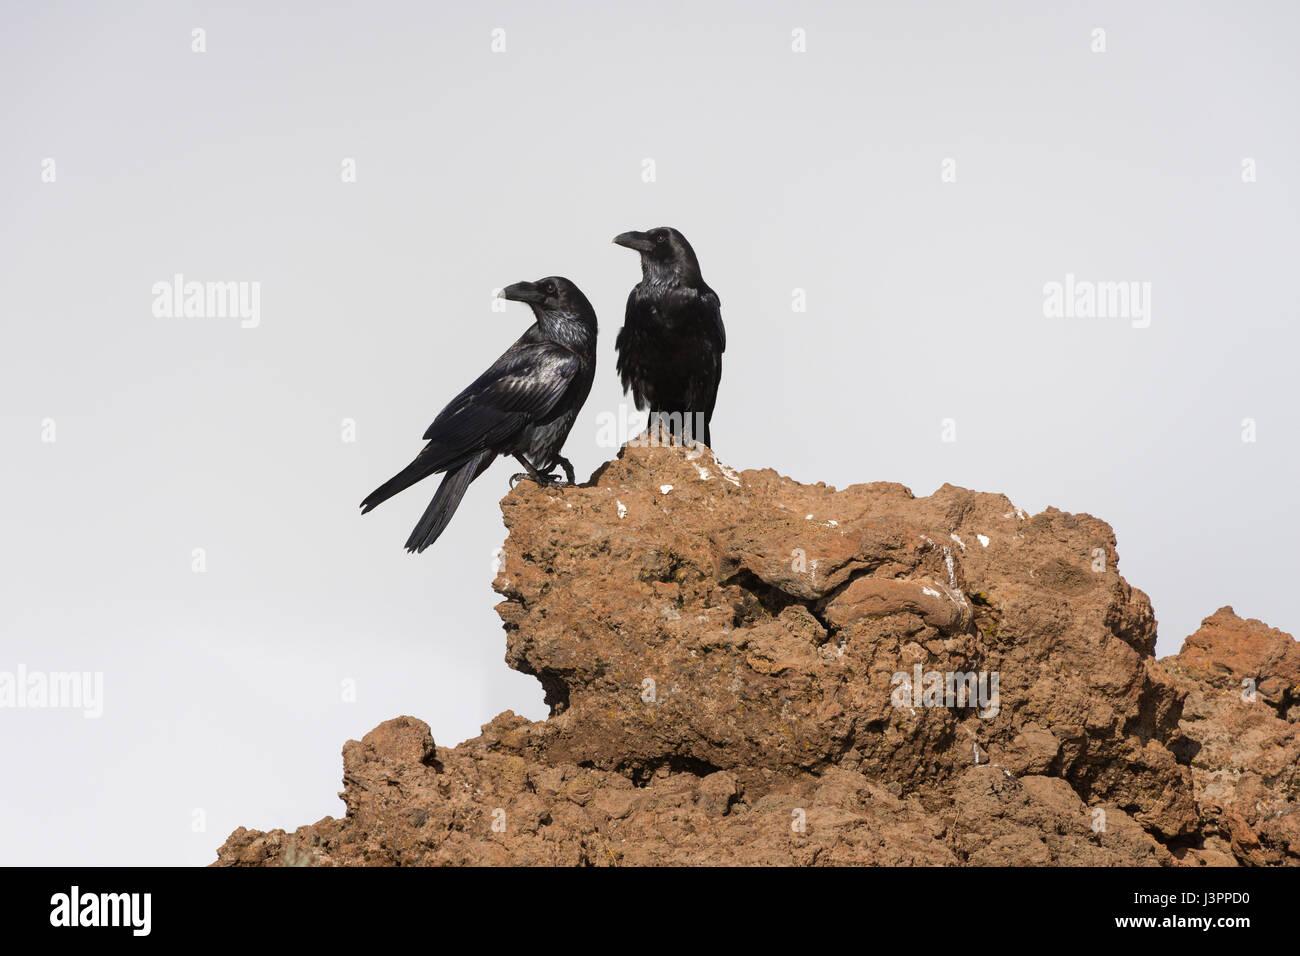 Kolkrabe, nördlichen Rabe, Roque de Los Muchachos, Tijarafe, La Palma, Spanien, Corvus Corax, Stockbild